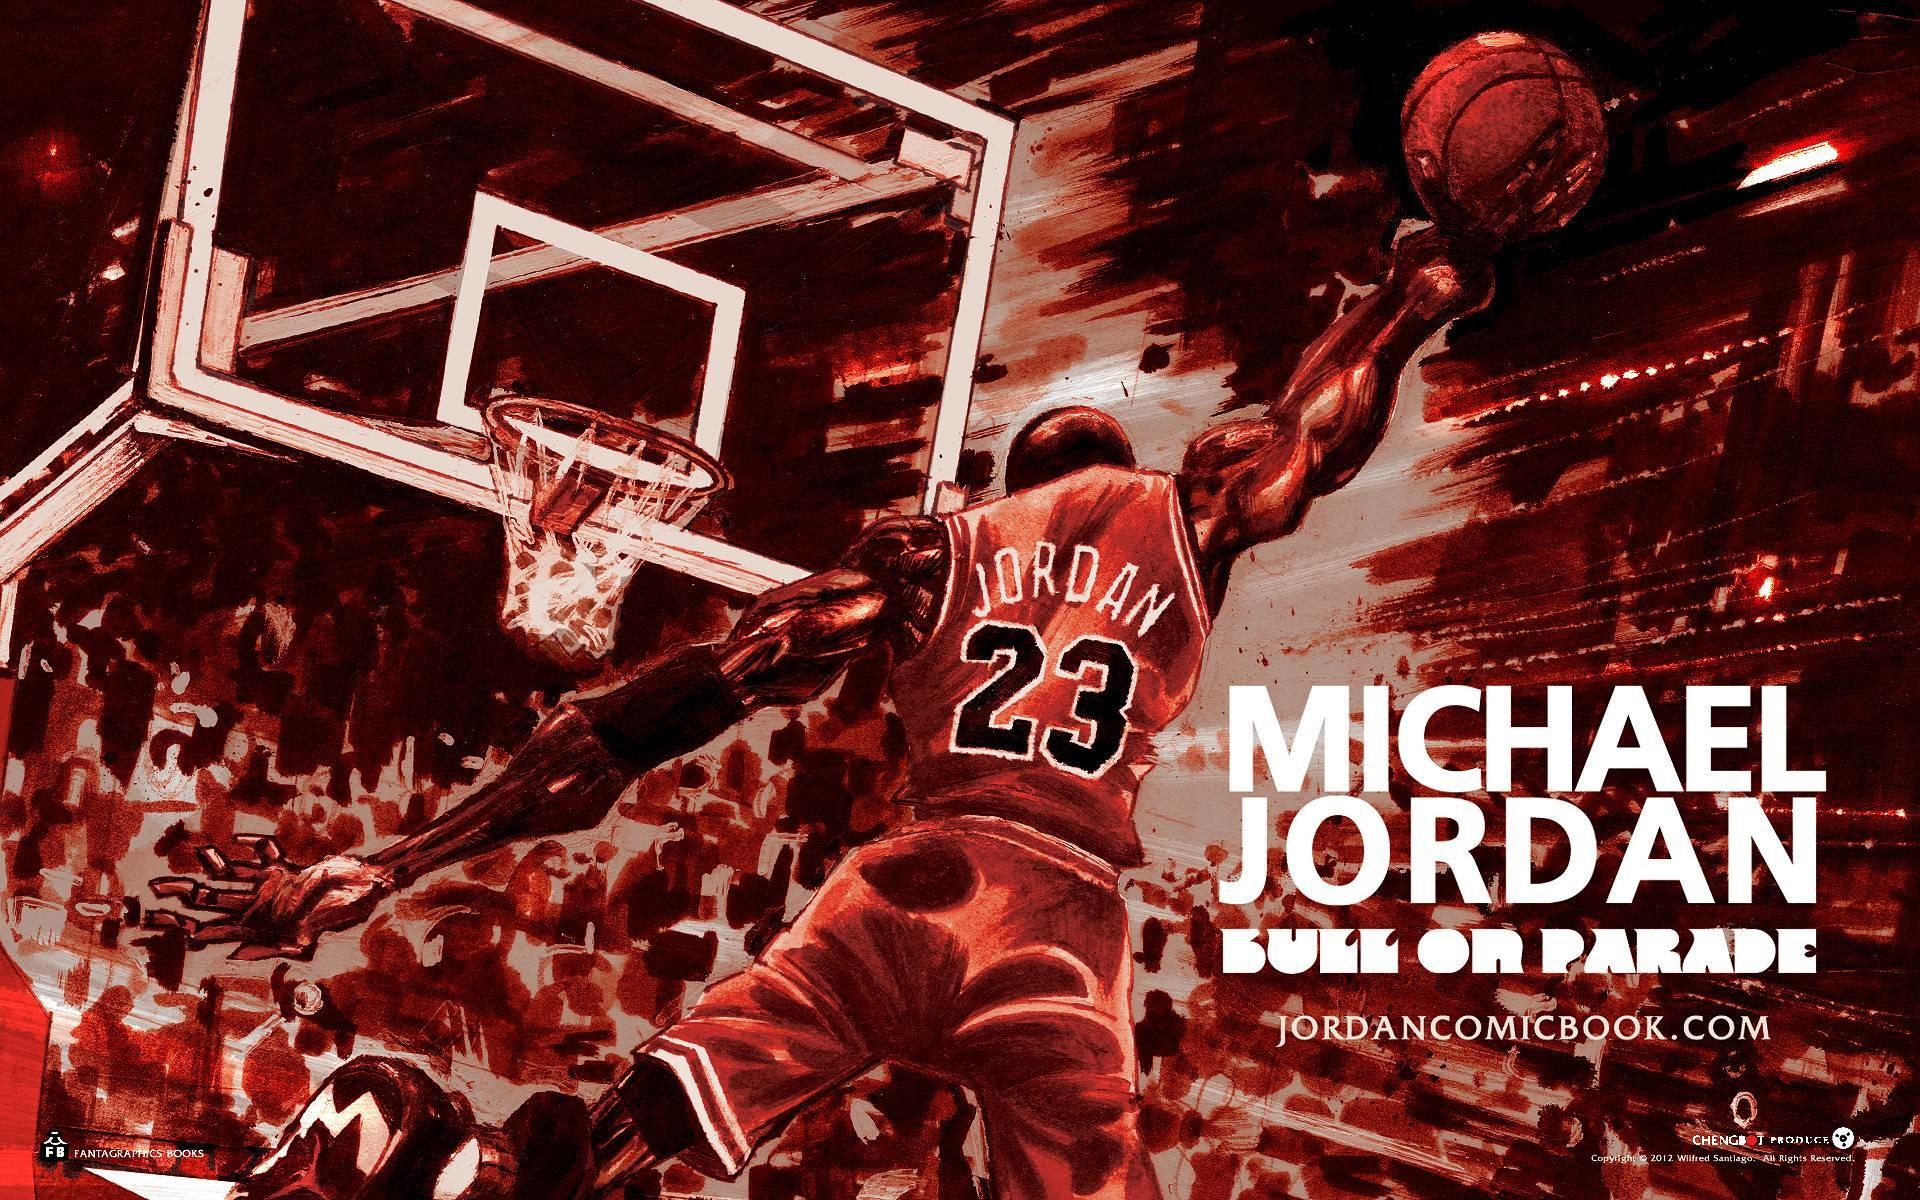 Download Michael Jordan Wallpaper Hd Background 9 HD Wallpapers .